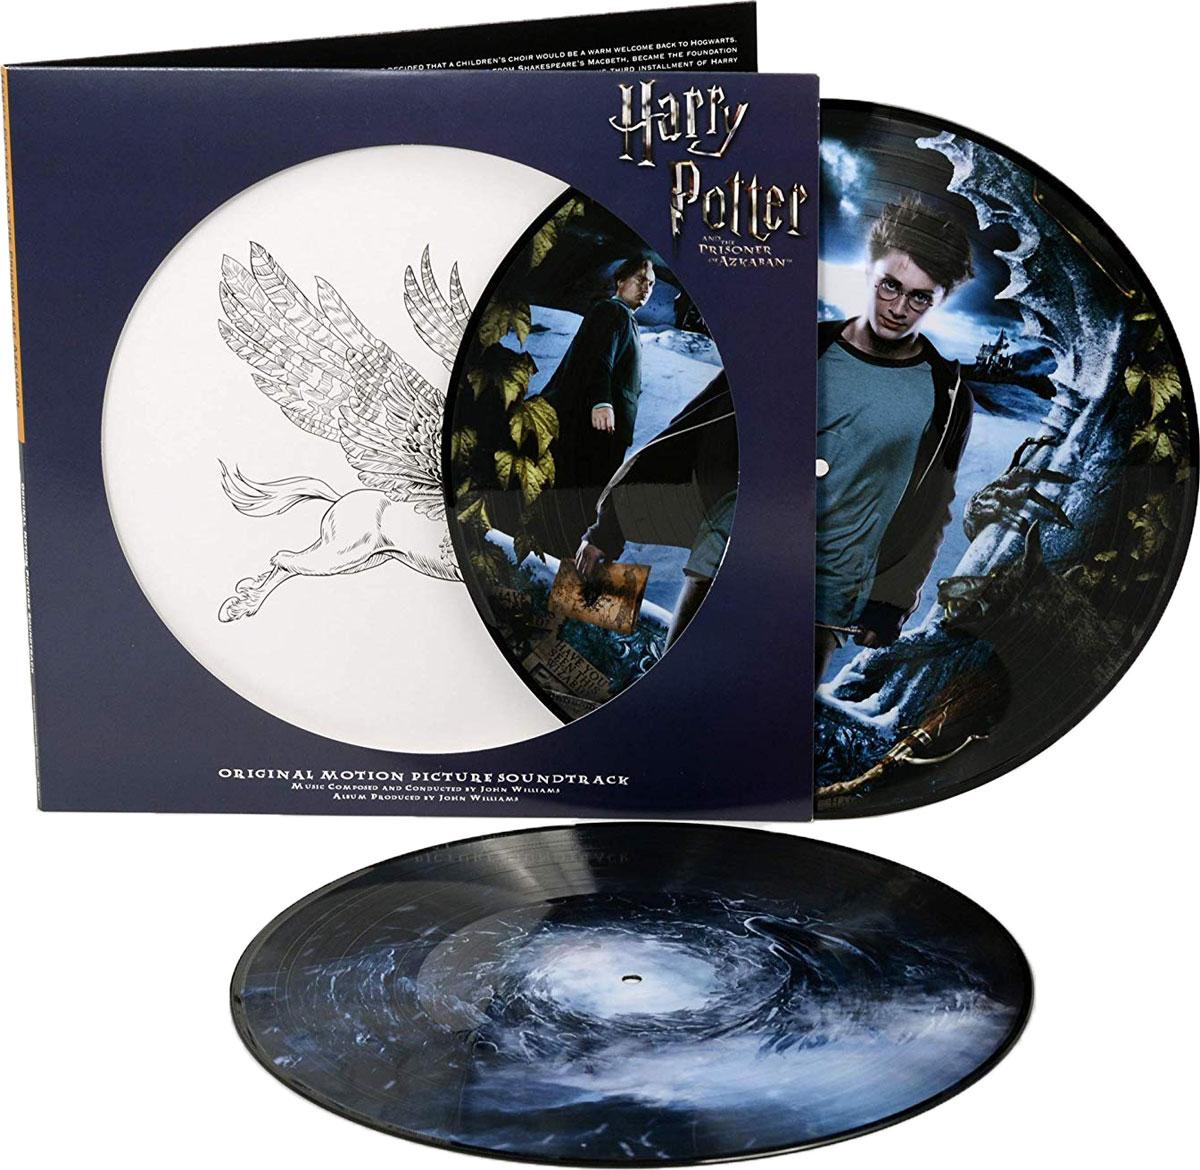 Harry Potter And The Prisoner Of Azkaban. Original Motion Picture Soundtrack (2 LP)